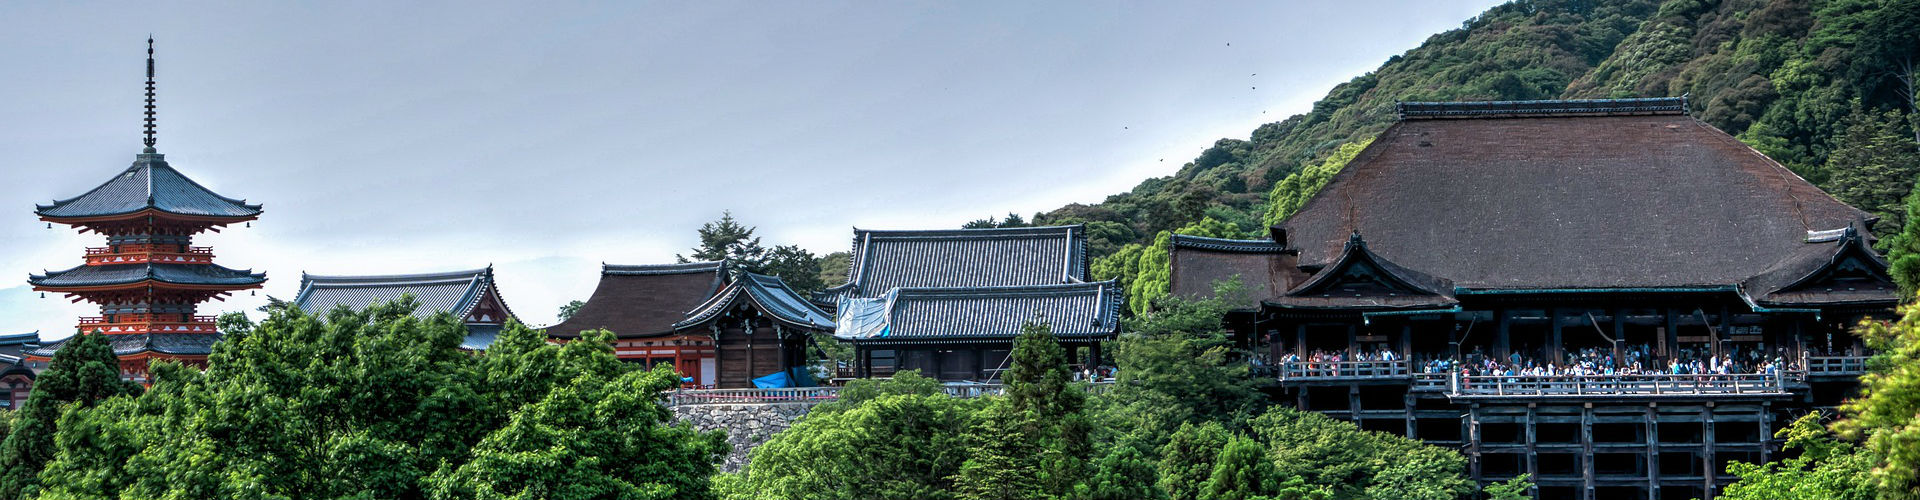 kiyomizu-dera-1449399_1920_ok